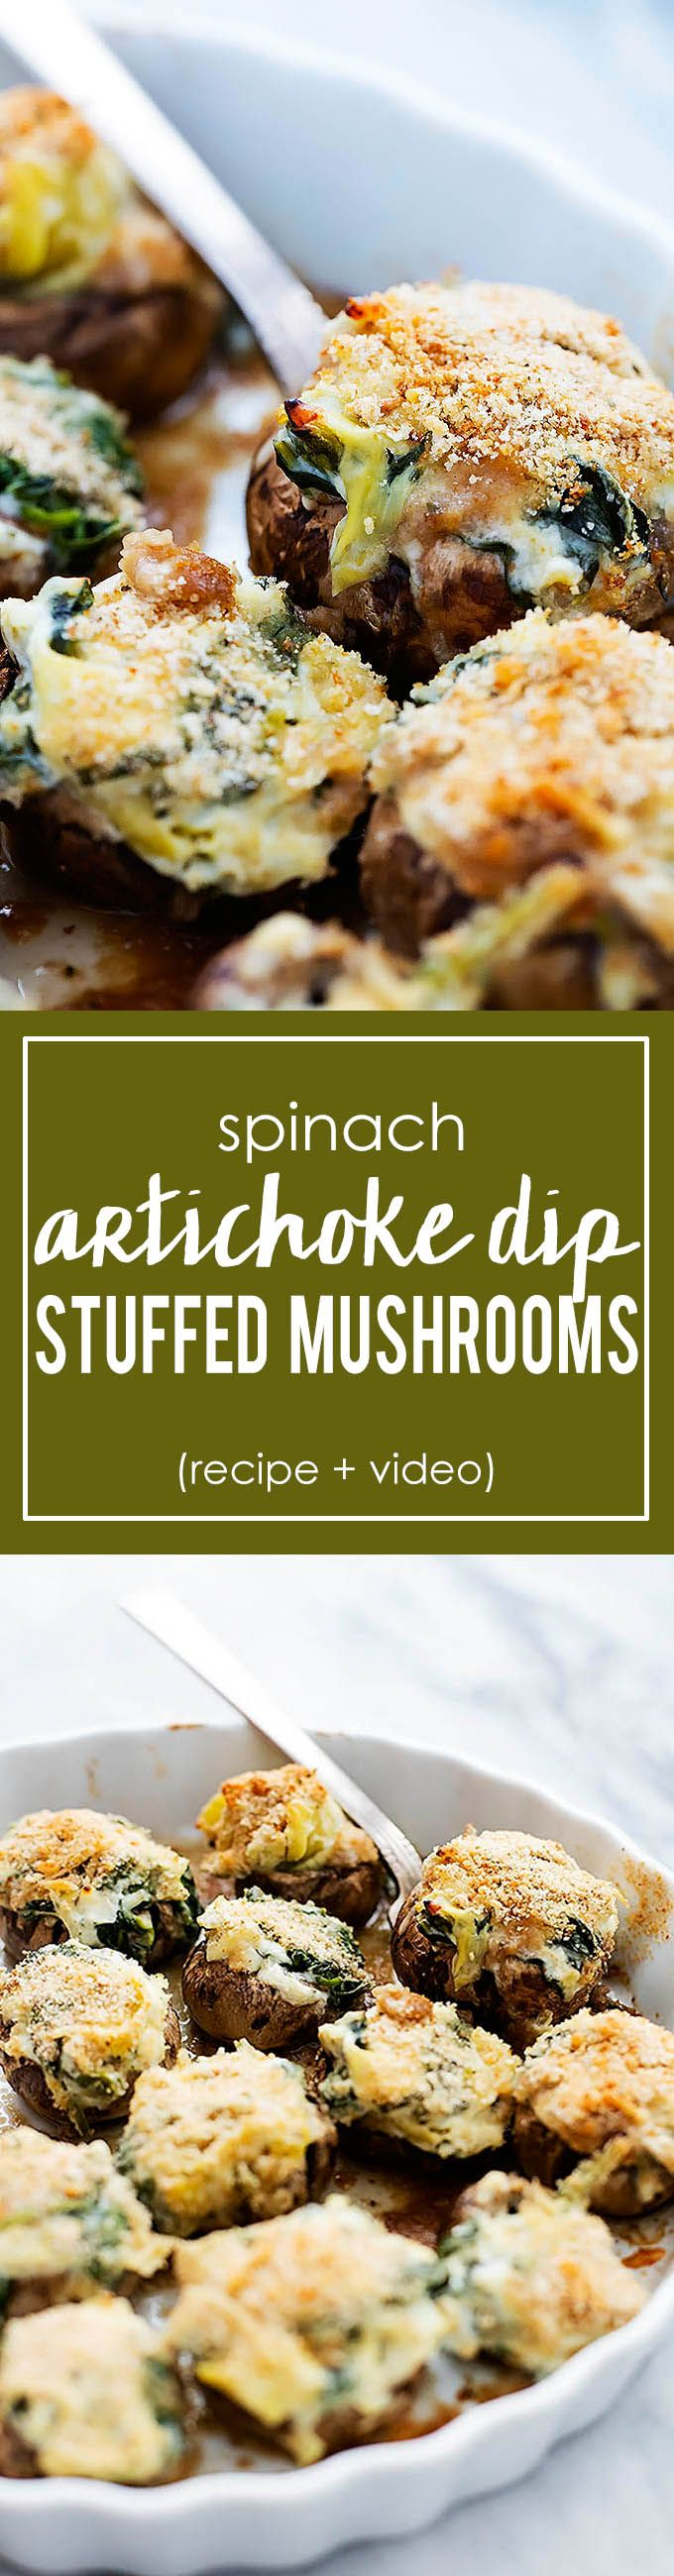 Spinach Artichoke Dip Stuffed Mushrooms | Creme de la Crumb